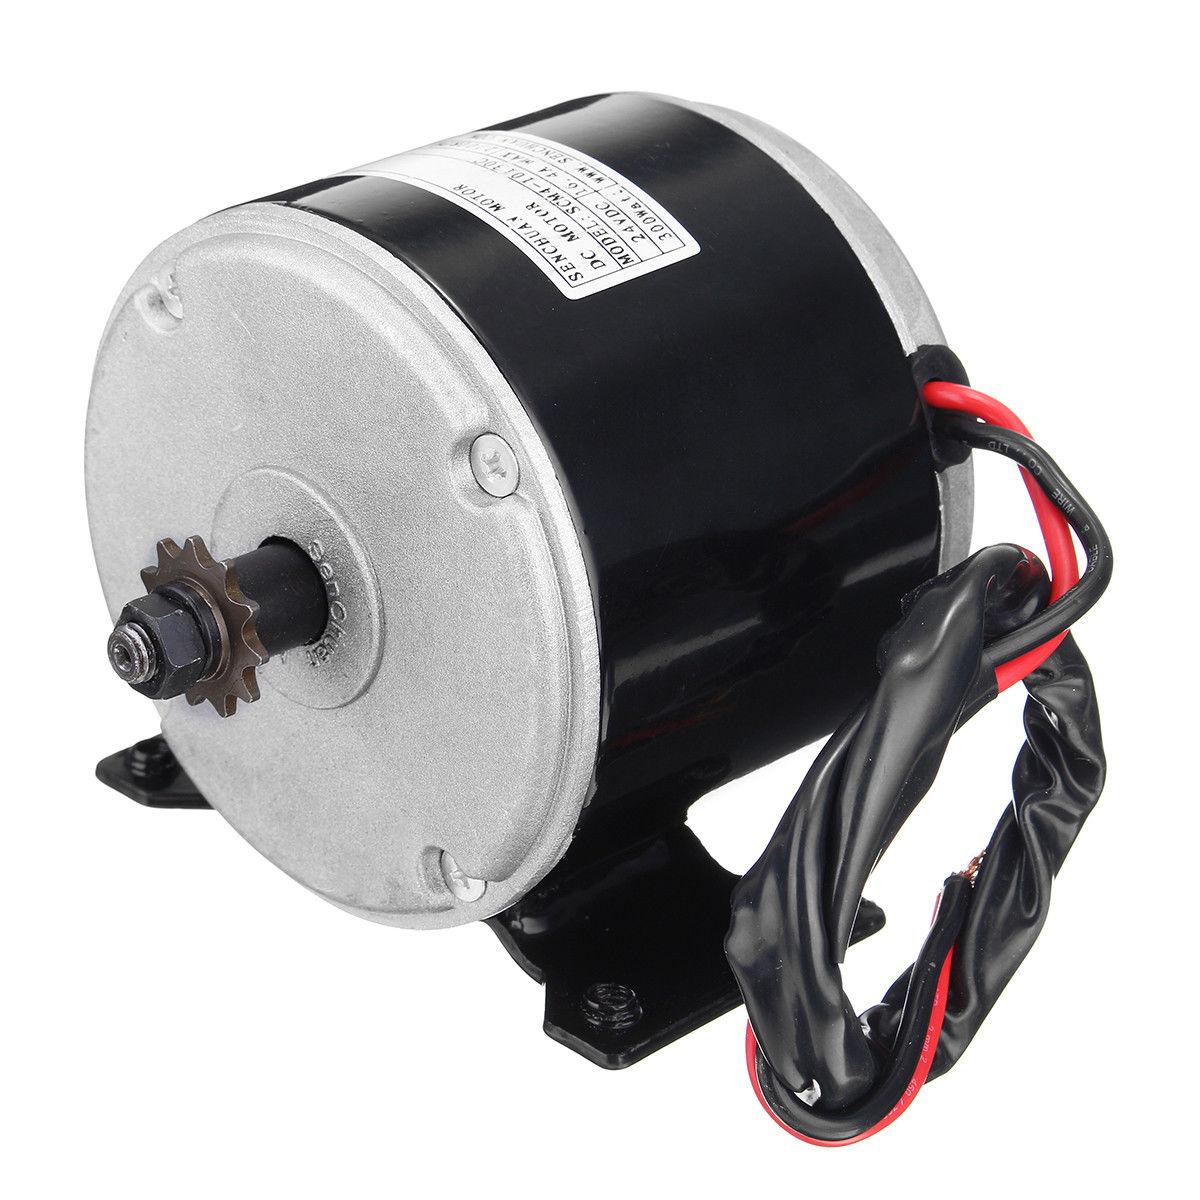 300W Magnetmotor Freie Energie Generator Perpetuum Mobile Permanent selber bauen